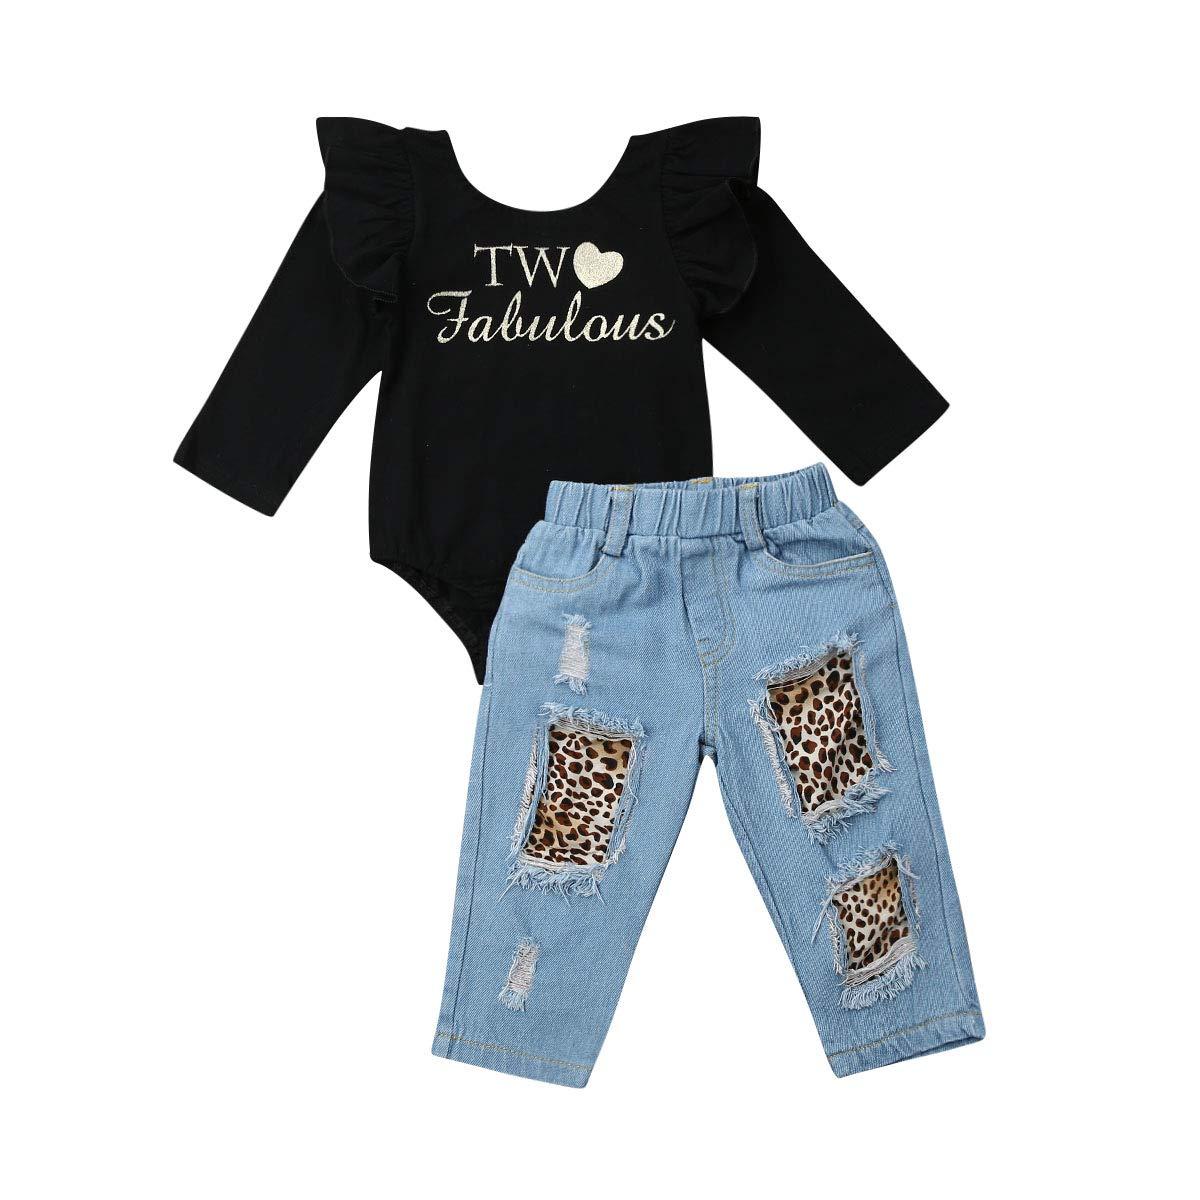 Muasaaluxi Toddler Baby Girls Shark Romper Sleeveless Bodysuit Headband Playsuit Sunsuit Jumpsuit Outfits 0-24M